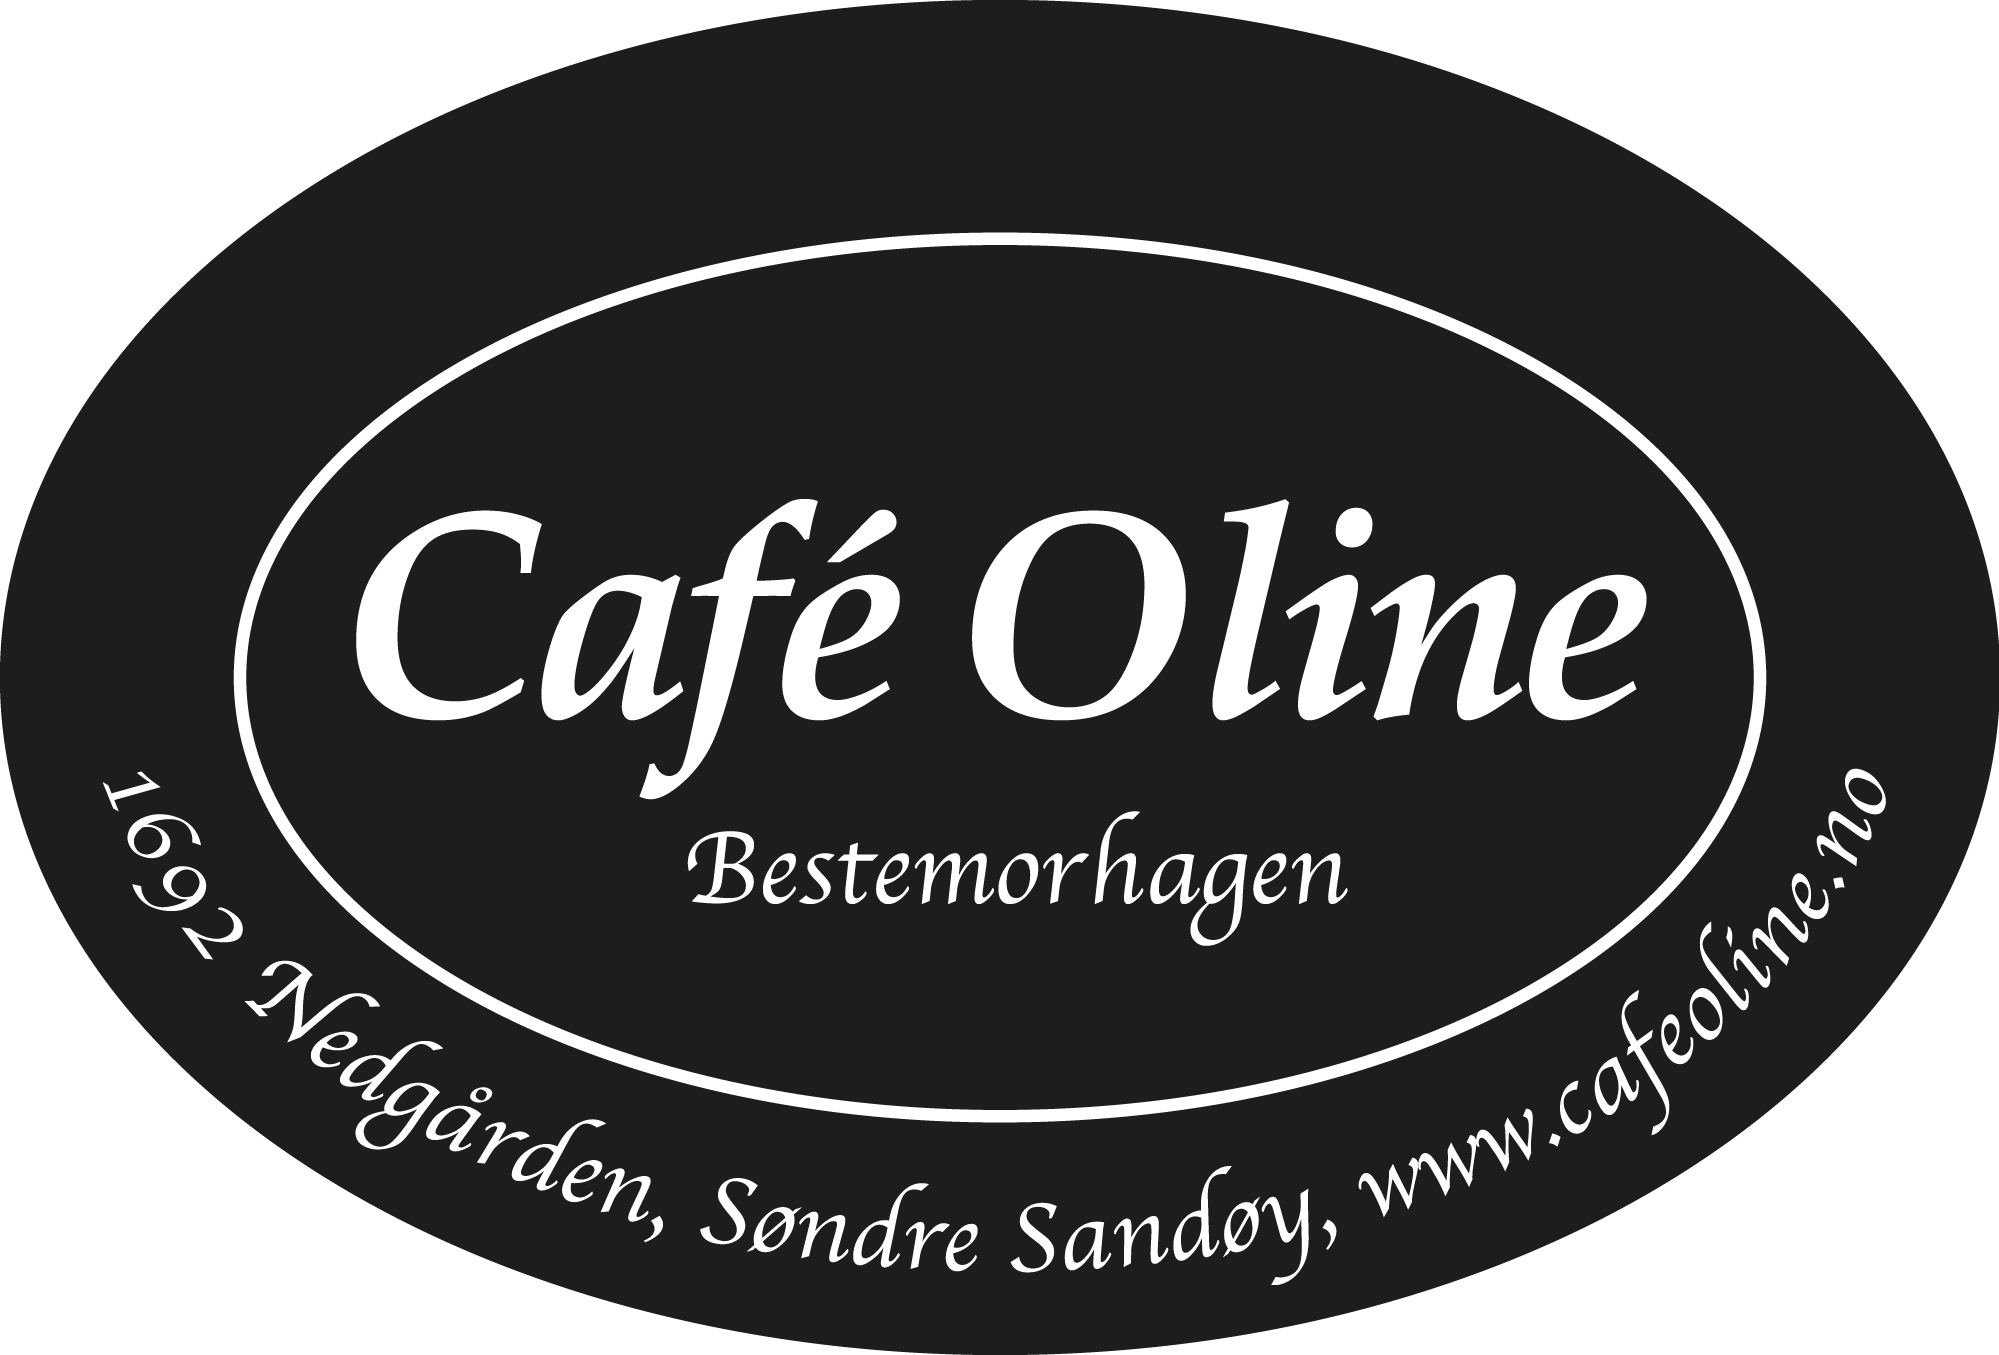 Café Oline